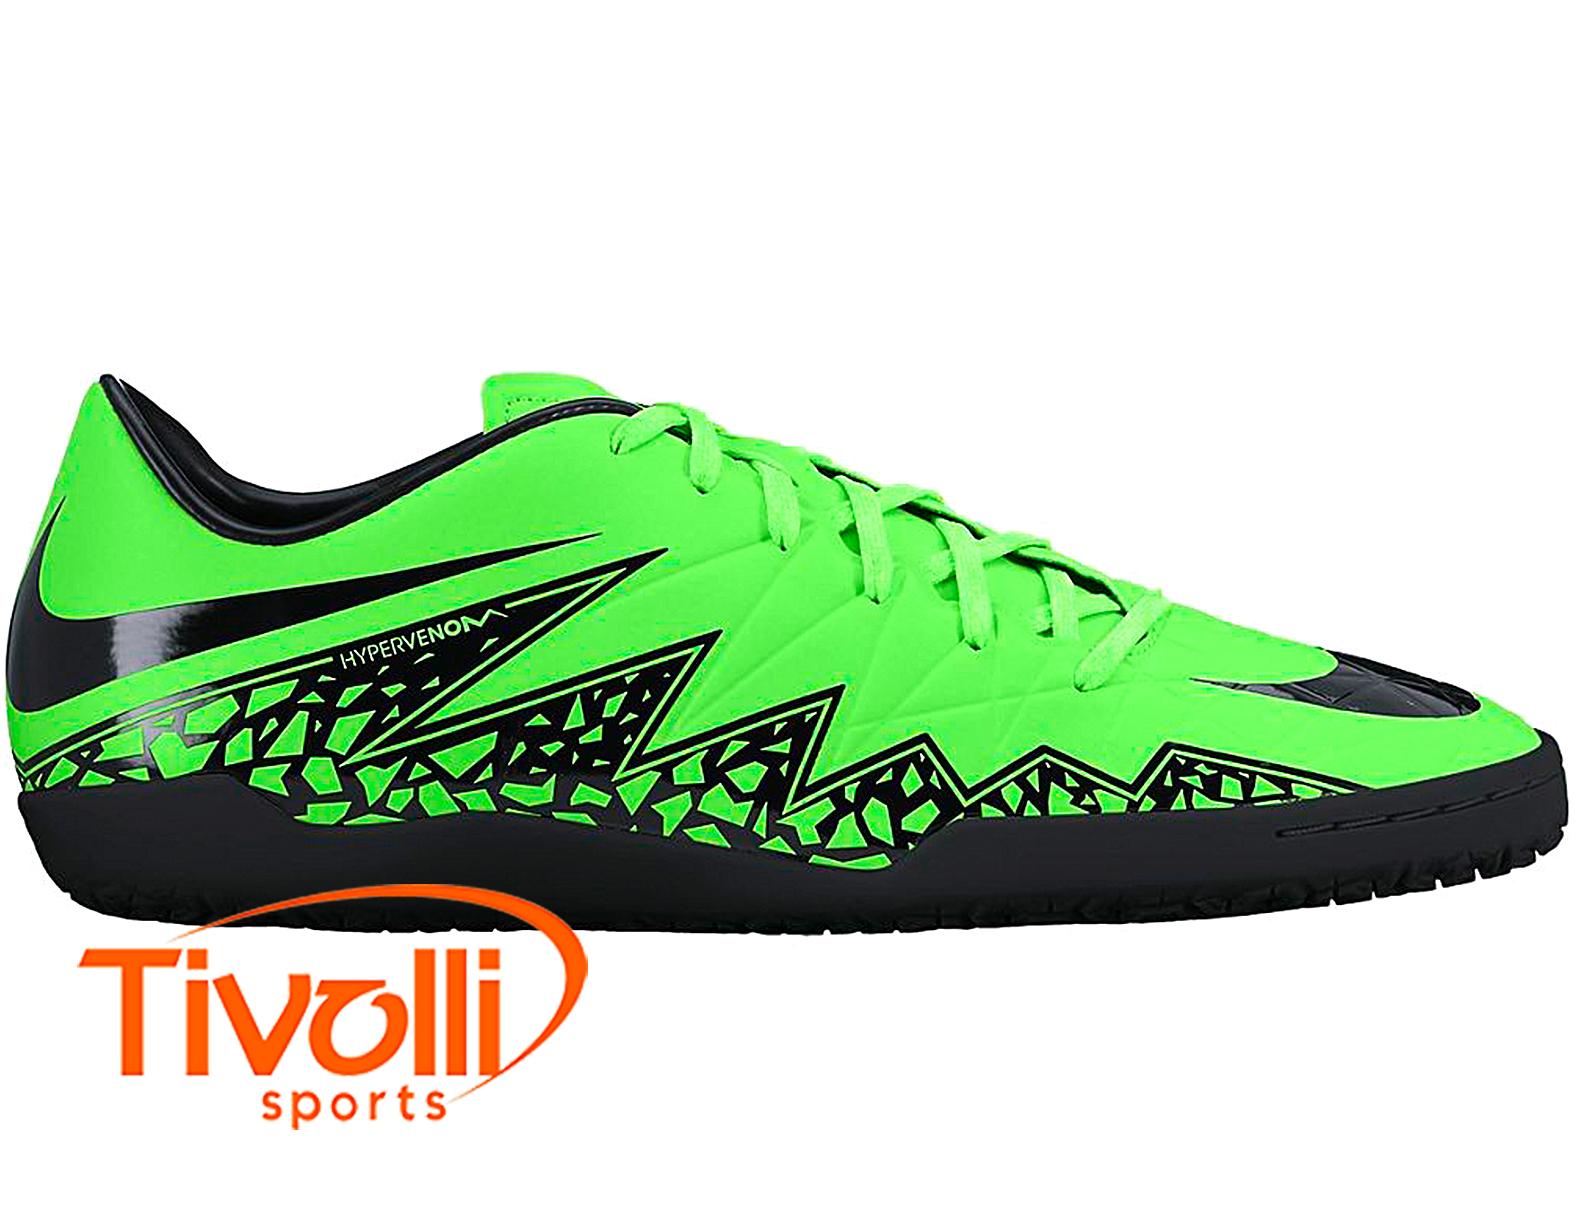 b0b5936602 Black Friday - Chuteira infantil futsal Nike Hypervenom Phelon II IC Verde  e preta